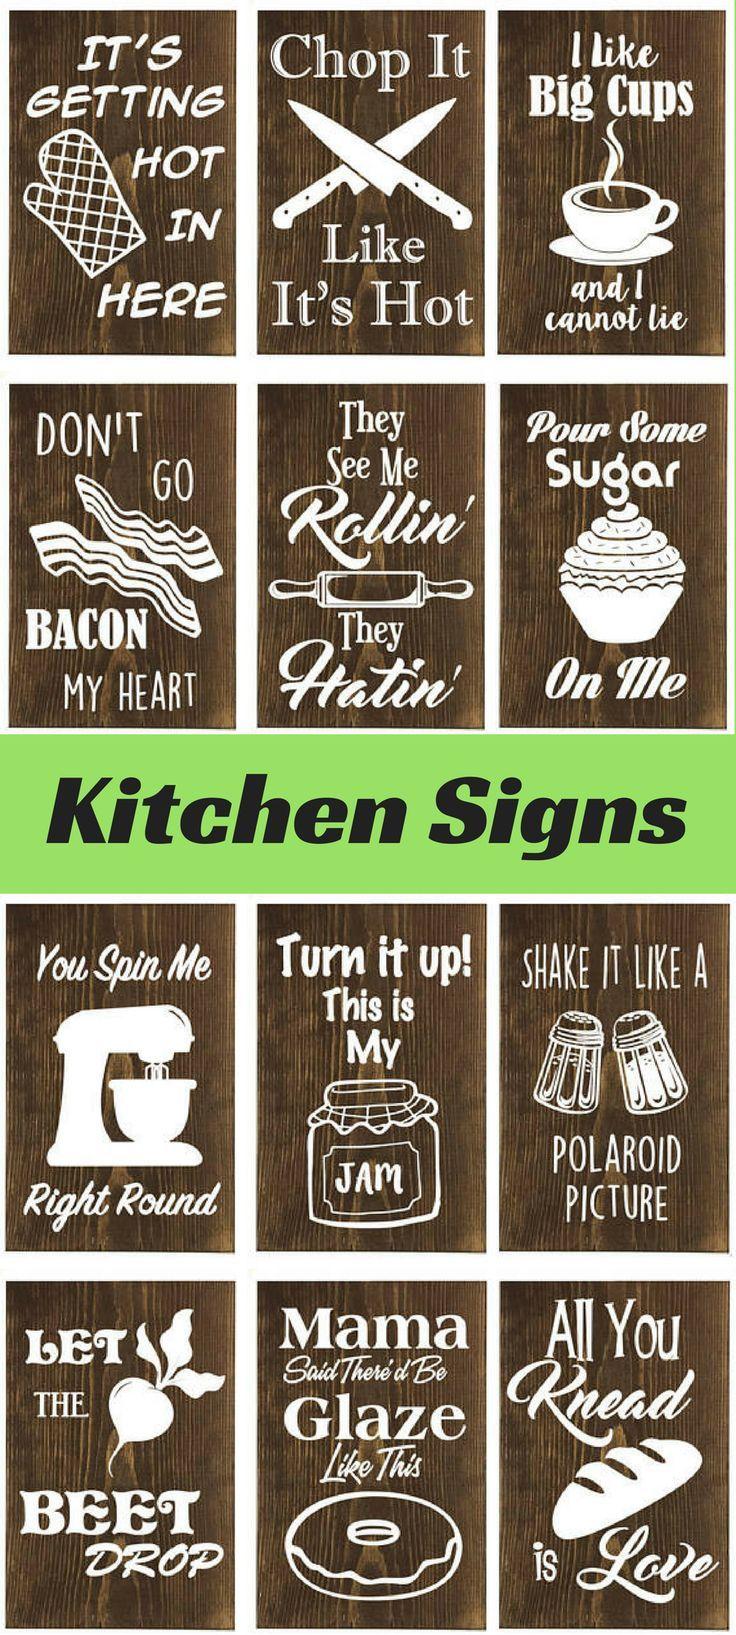 Funny Wooden Kitchen Sign Wall Decor Kitchen Humor Housewarming Kitchen Decor Home Decor Con Funny Kitchen Signs Wooden Kitchen Signs Kitchen Decor Apartment